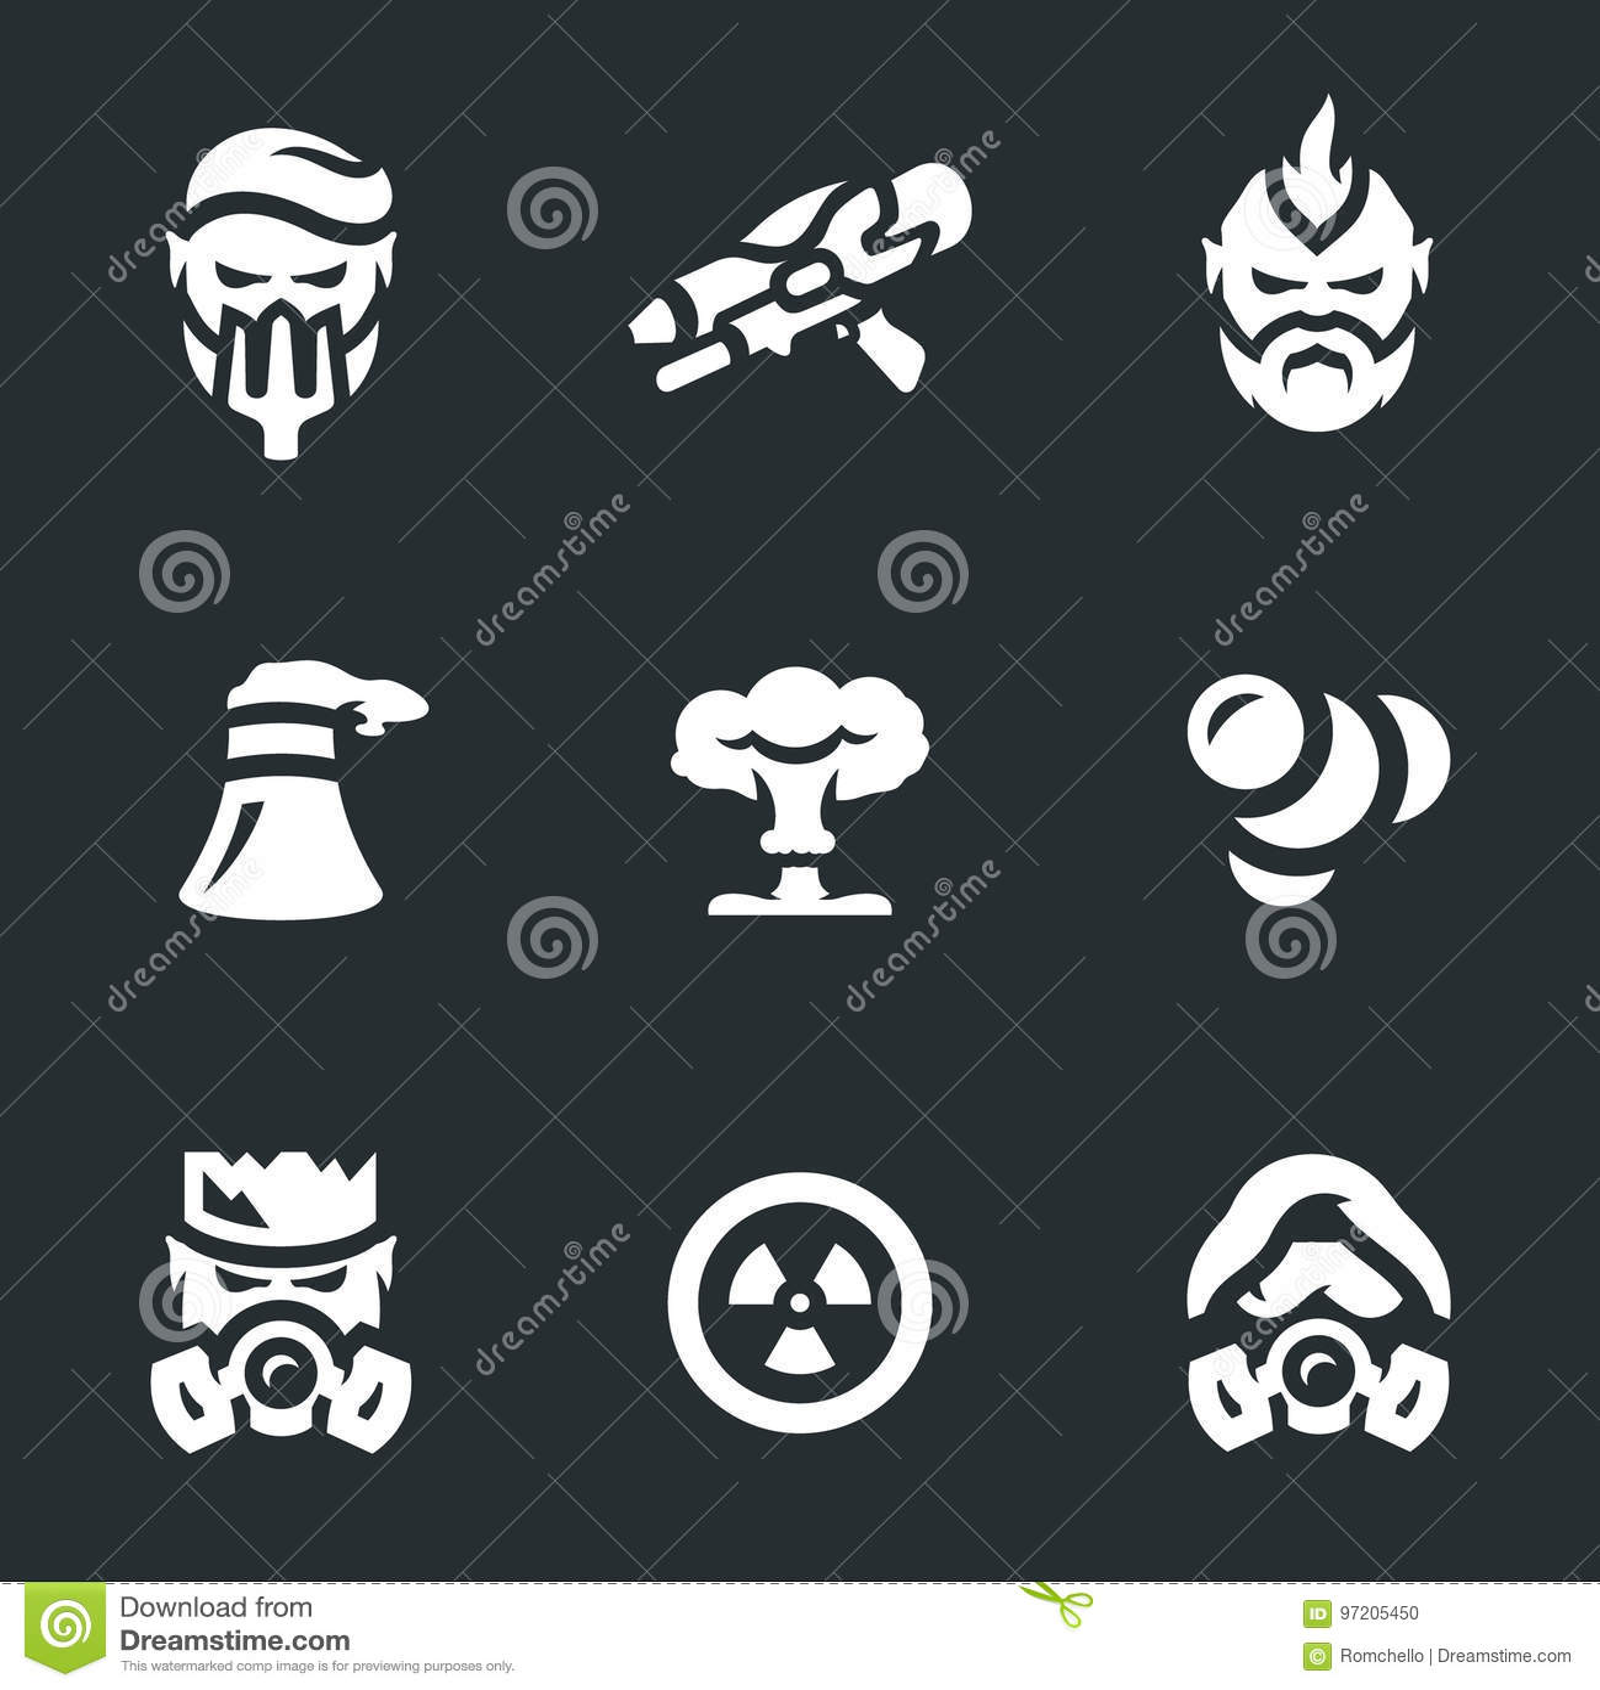 tower blaster download